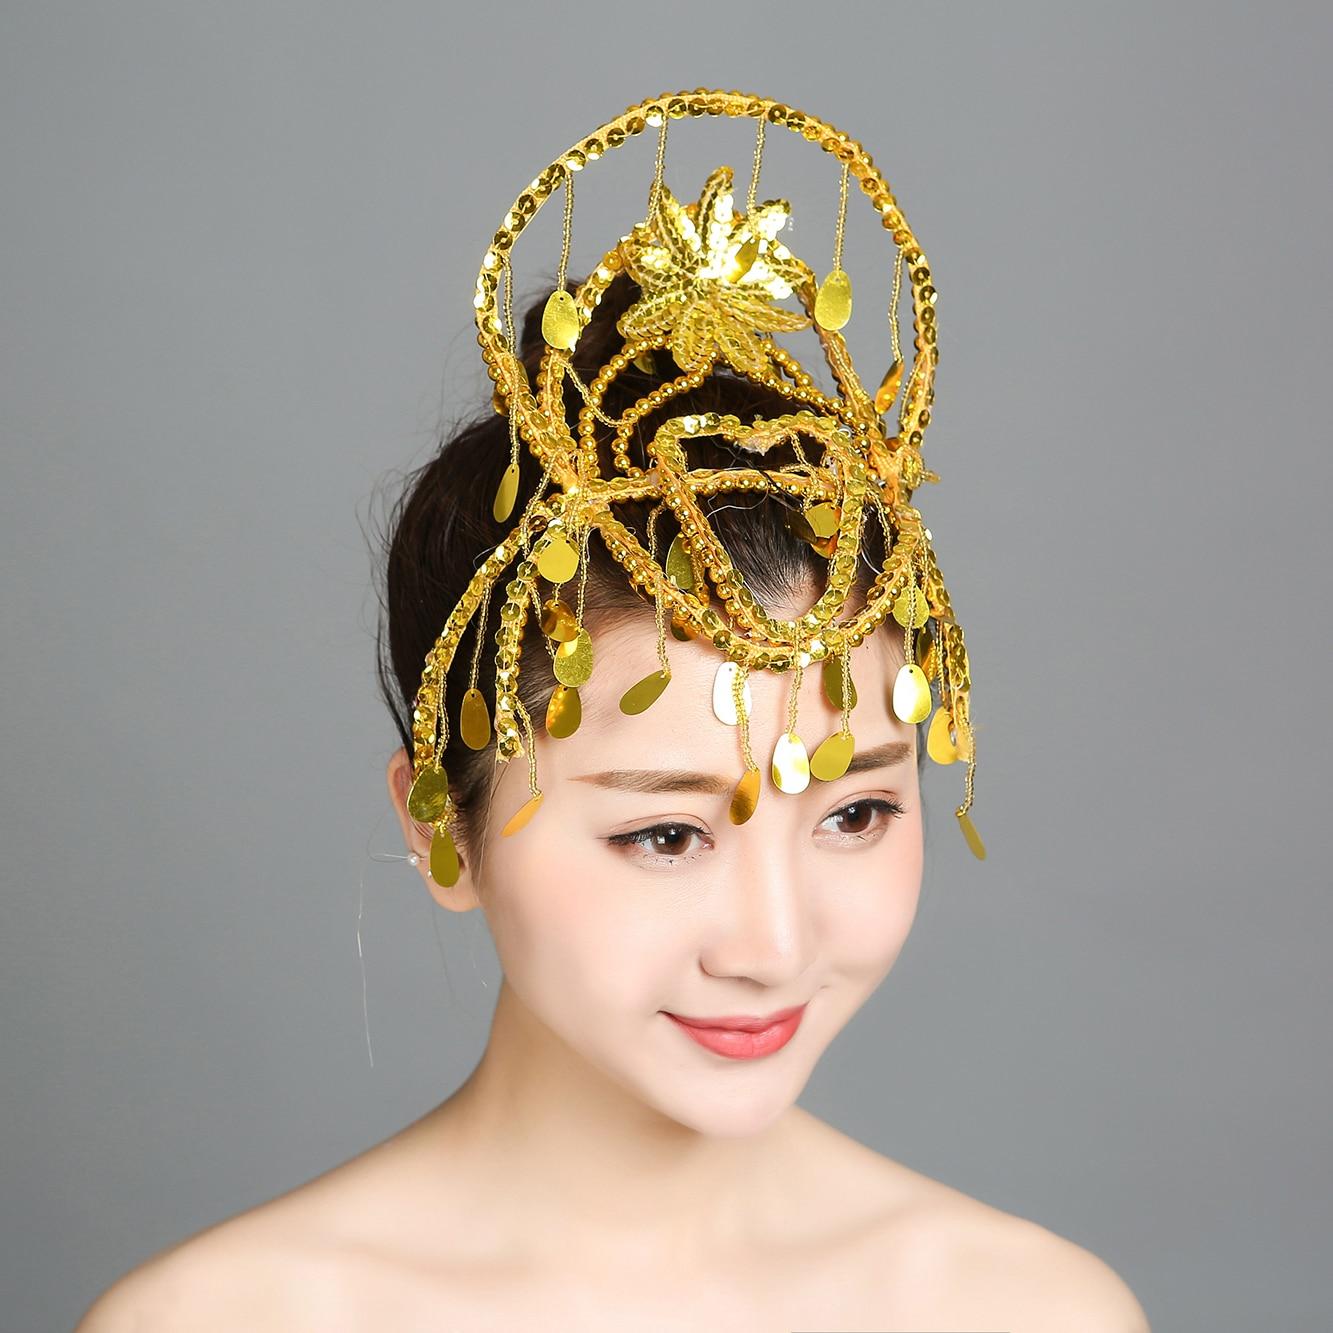 New Dance Performance Headdress Yangkotou Plum Blossom Square Dance Children's Adult Hair Ornaments  National Stage